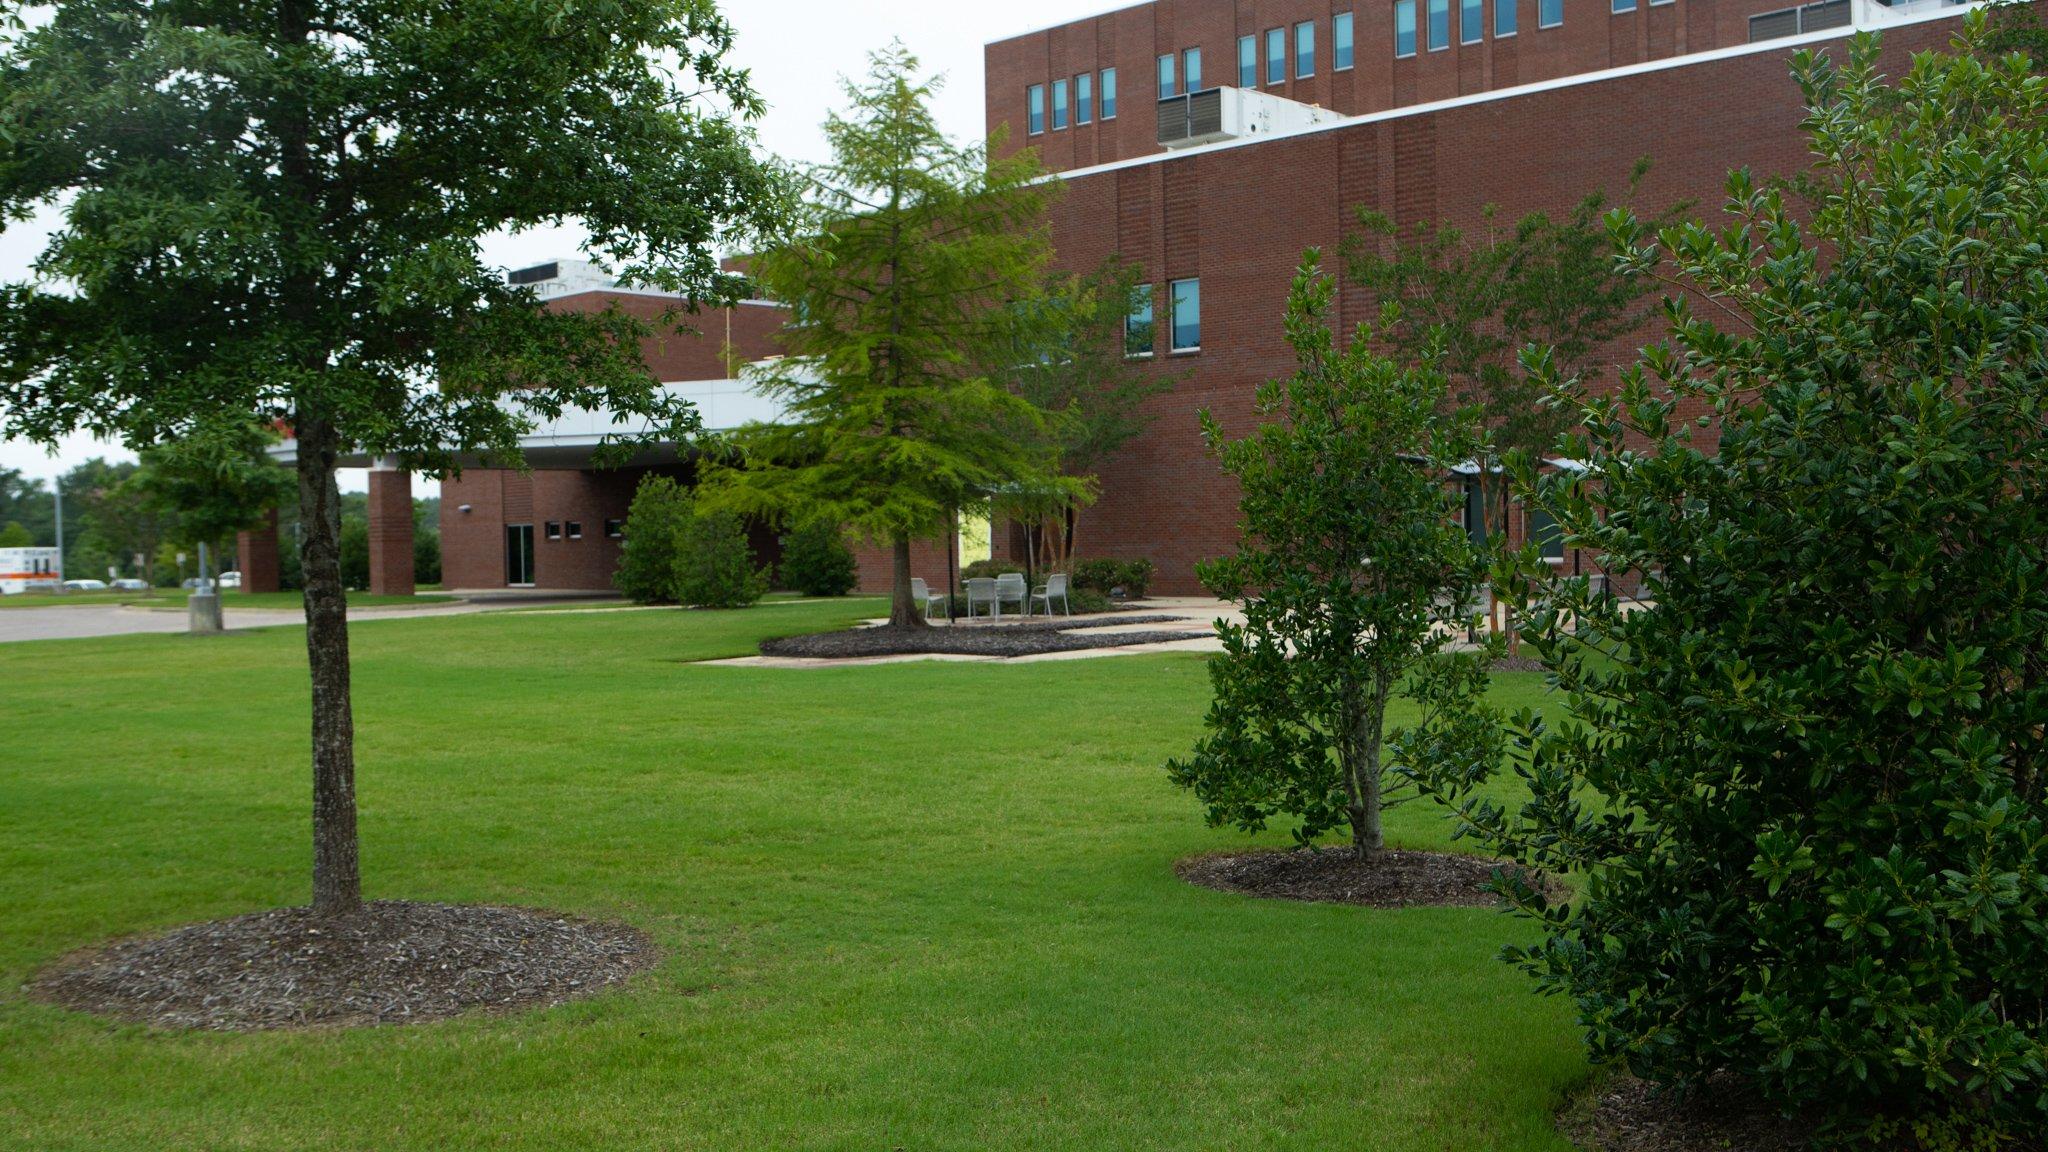 Methodist Olive Branch Hospital landscape and trees